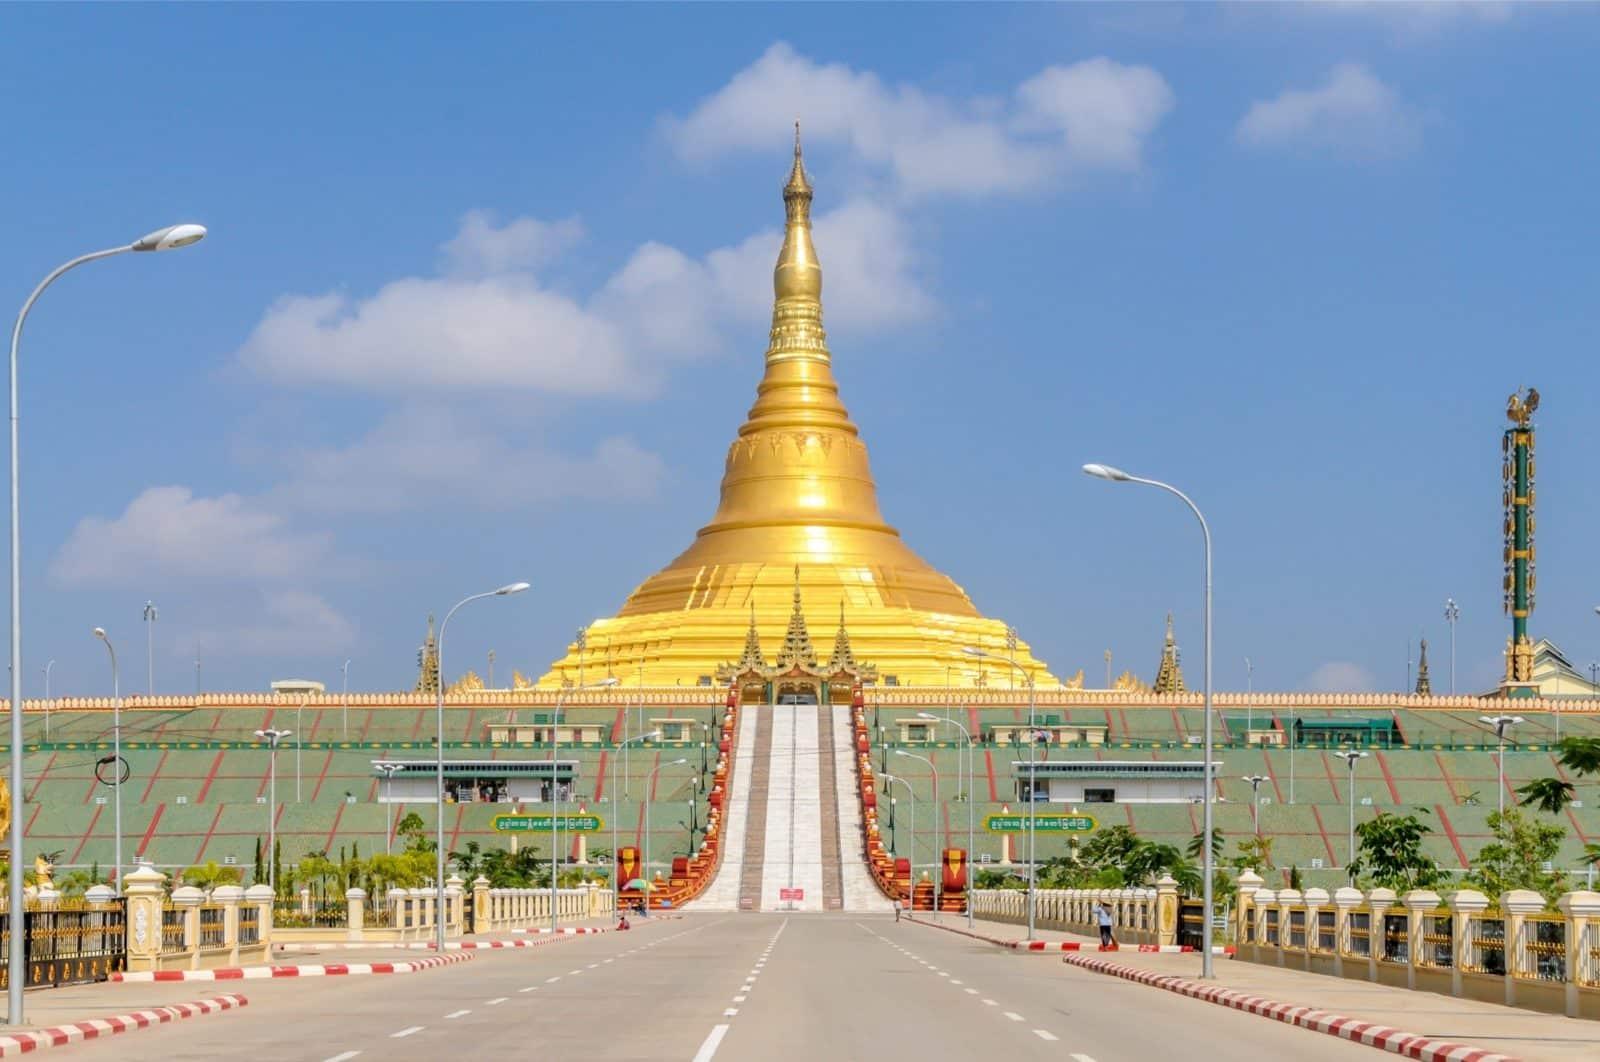 Die Uppatasanti Pagoda in der Hauptstadt Naypyidaw